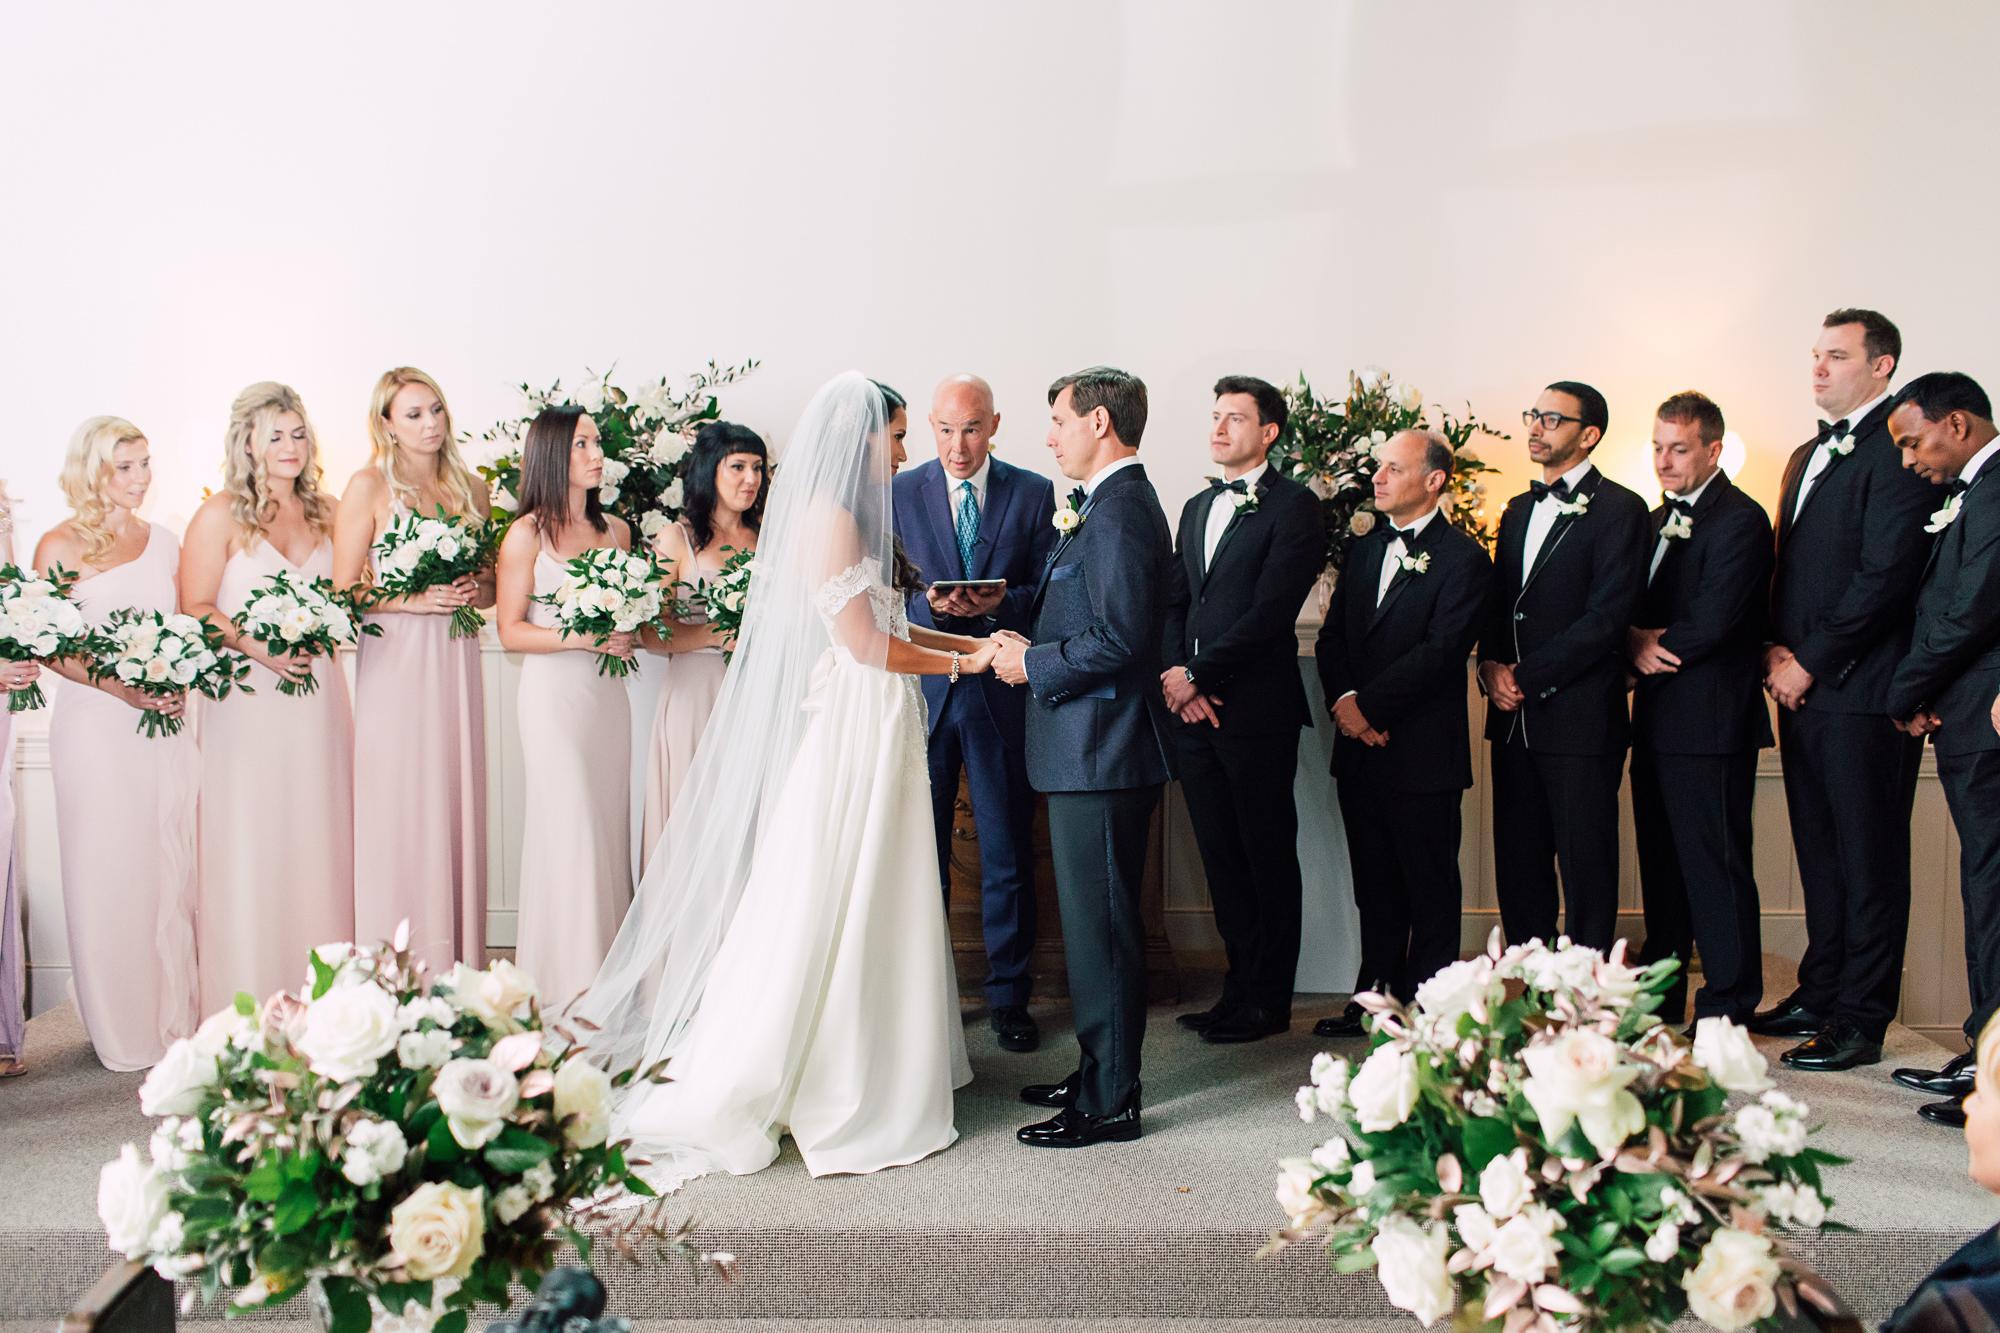 precious flowers wedding ceremony